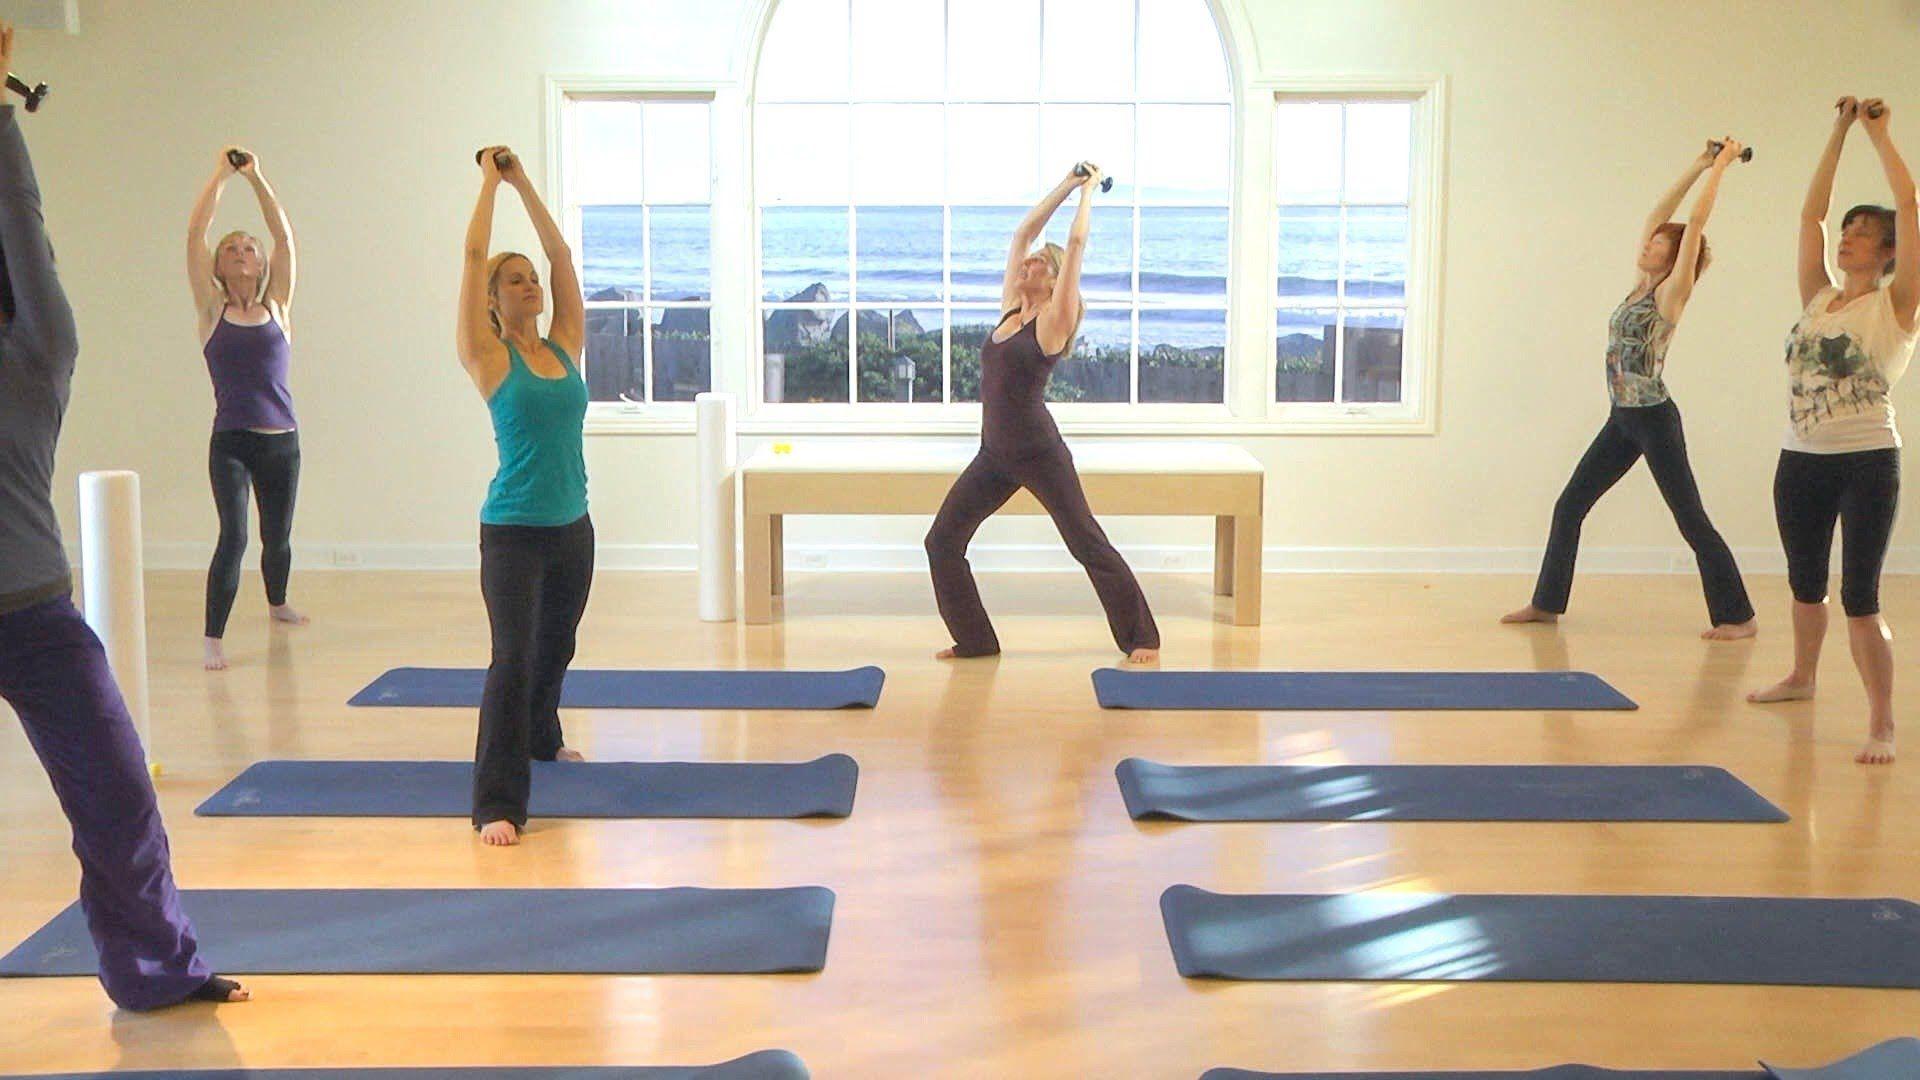 Divo Muller Pilates Fascial Fitness Workout Avec Images